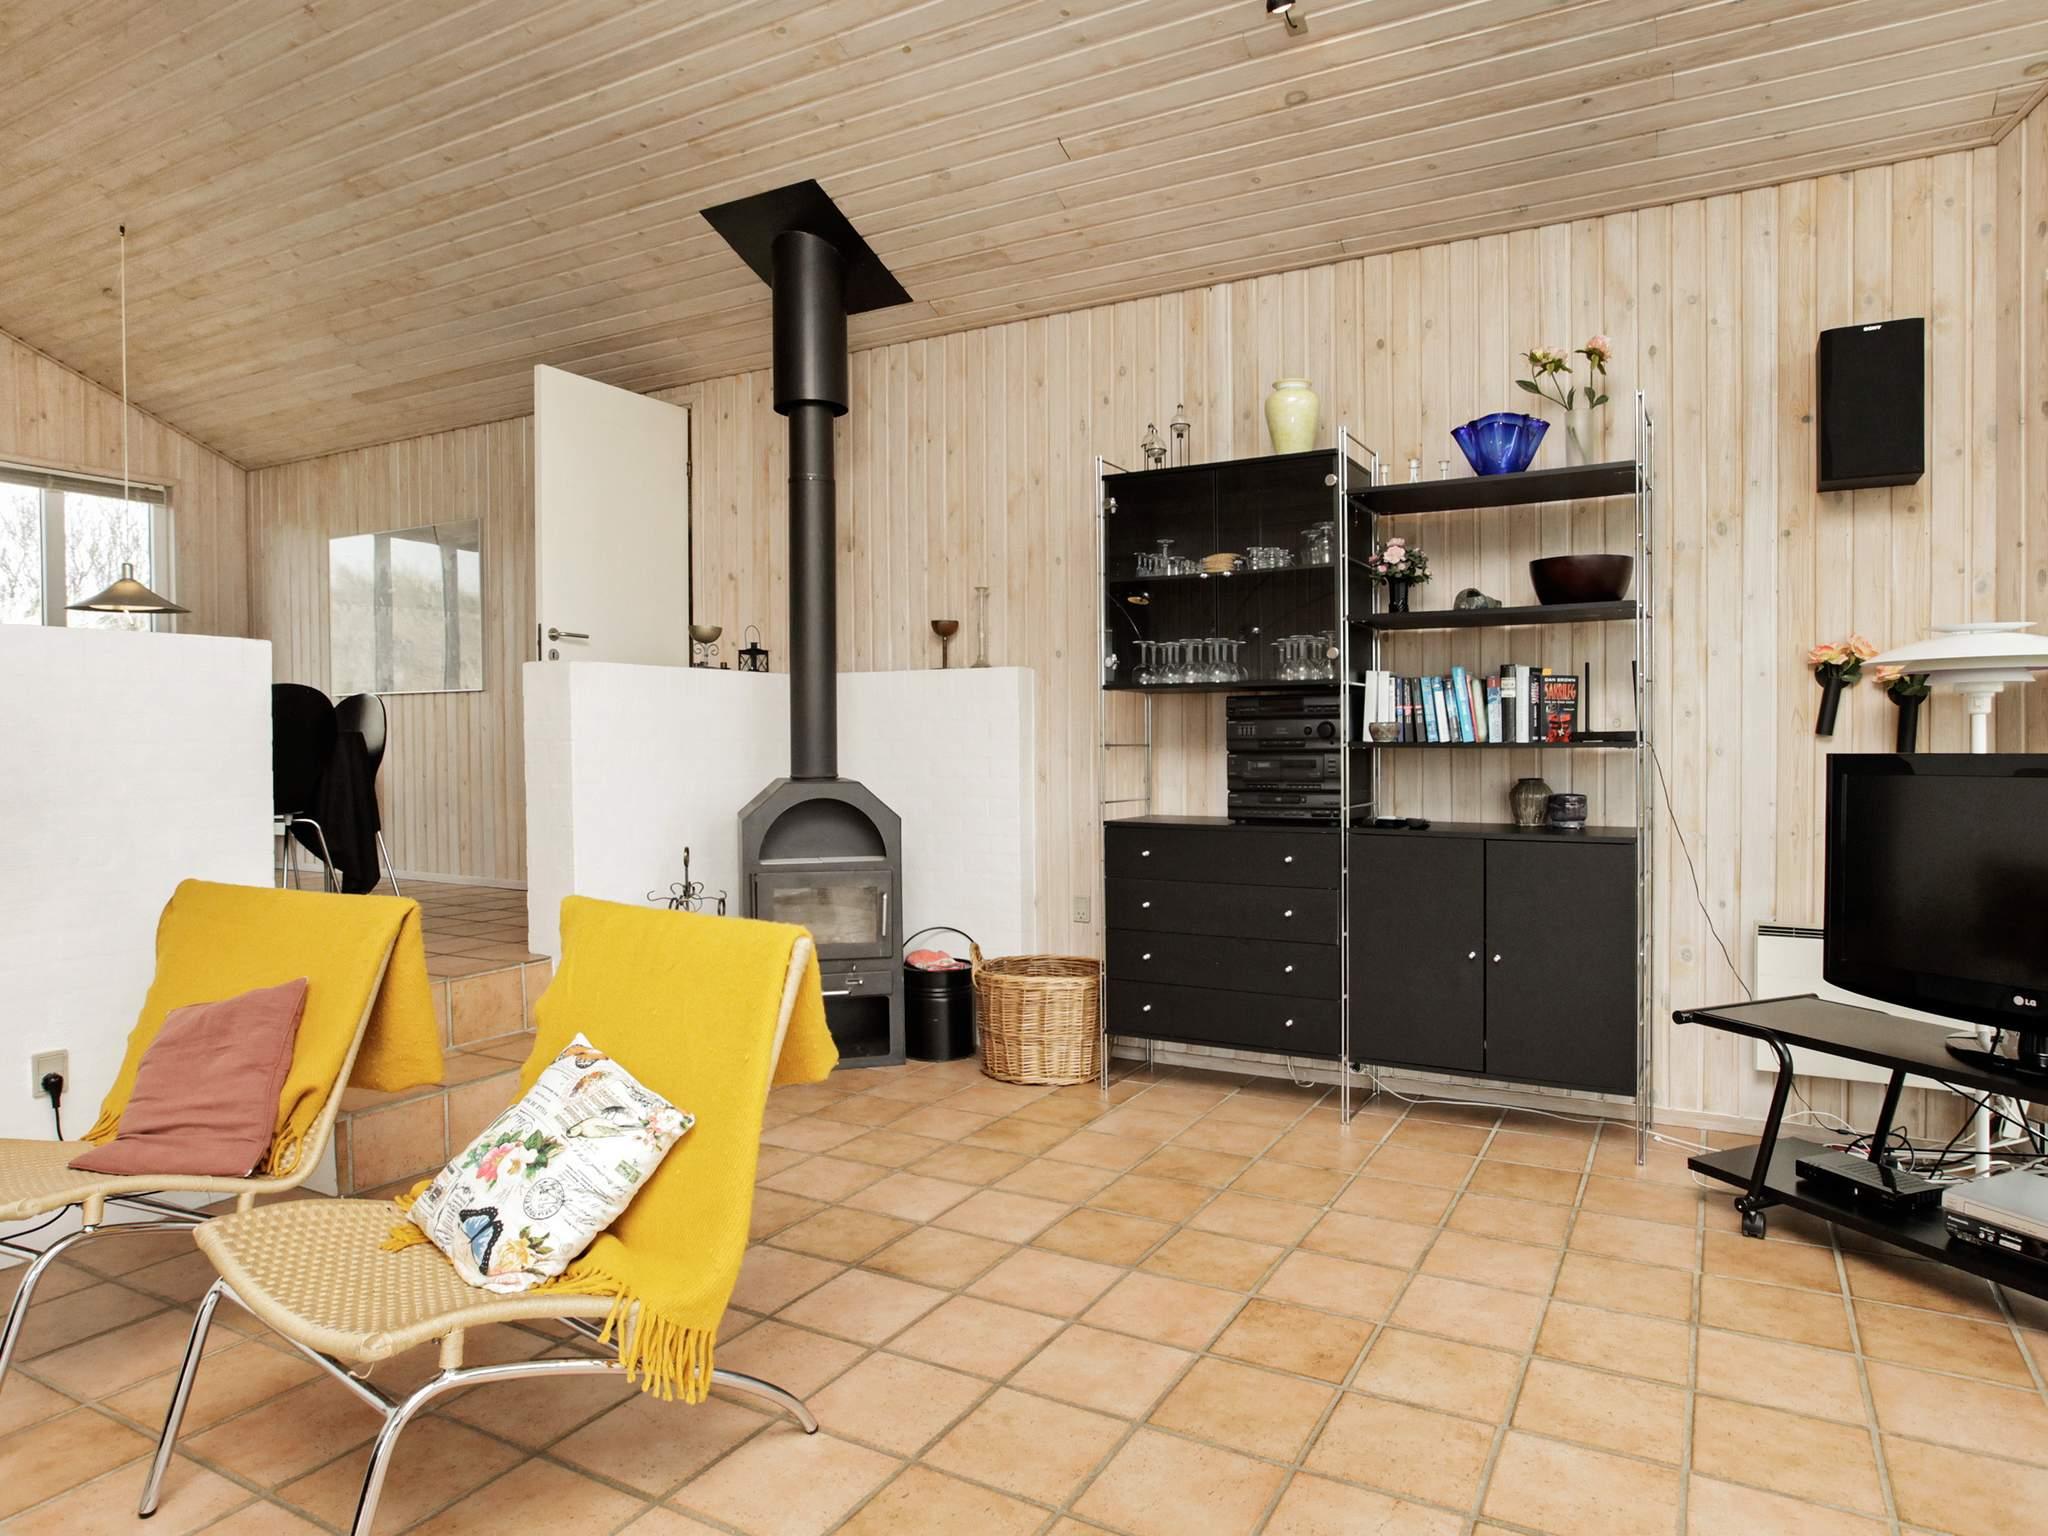 Ferienhaus Tversted (82208), Tversted, , Nordwestjütland, Dänemark, Bild 4